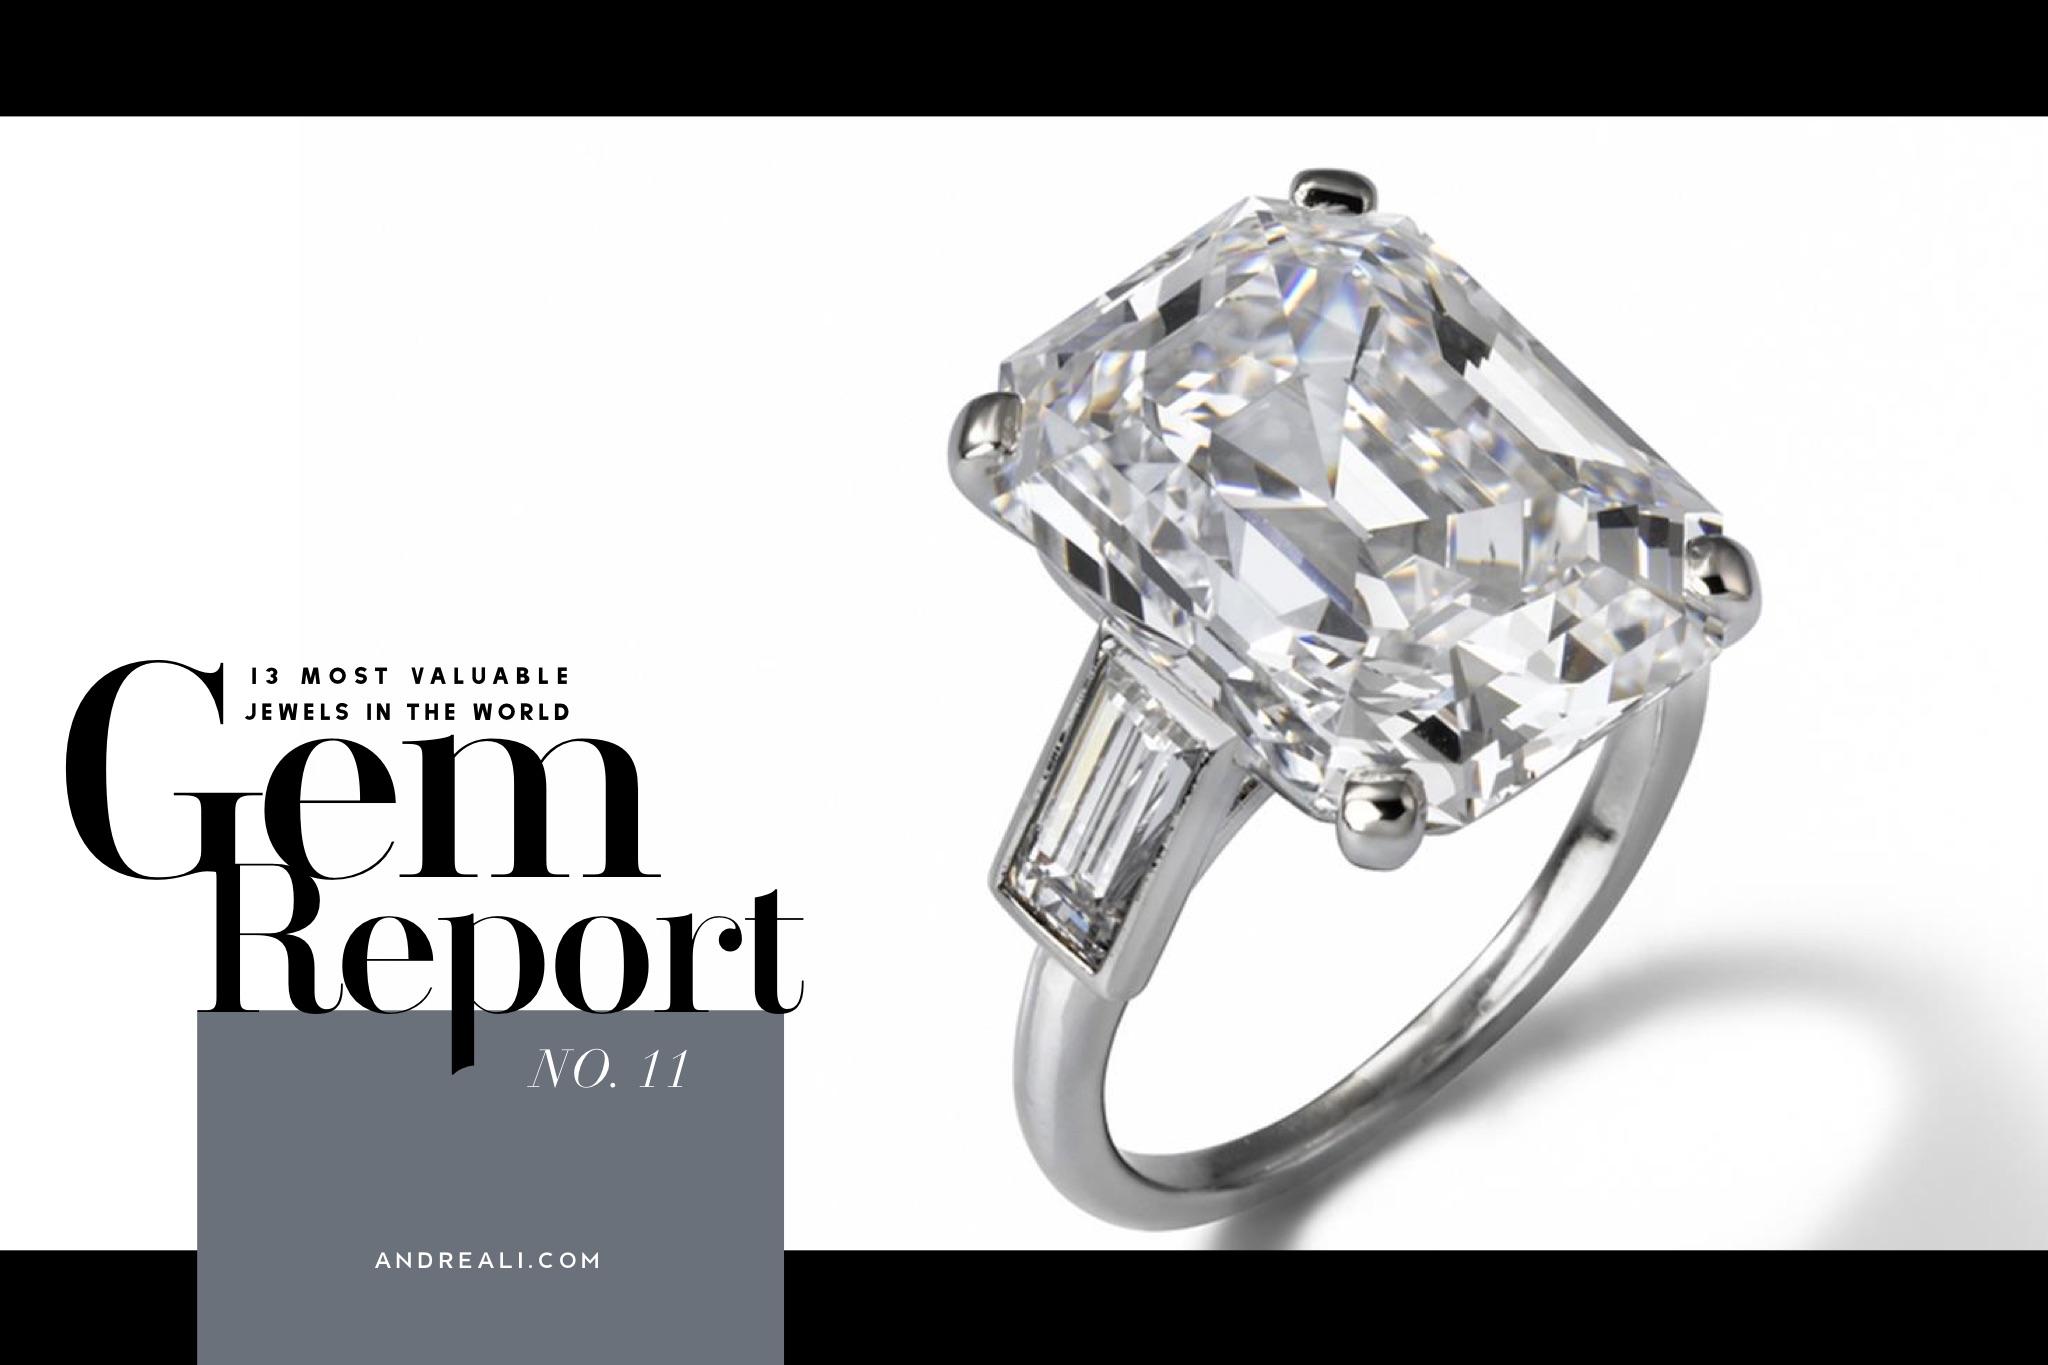 grace-kelly-engagement-ring.jpeg